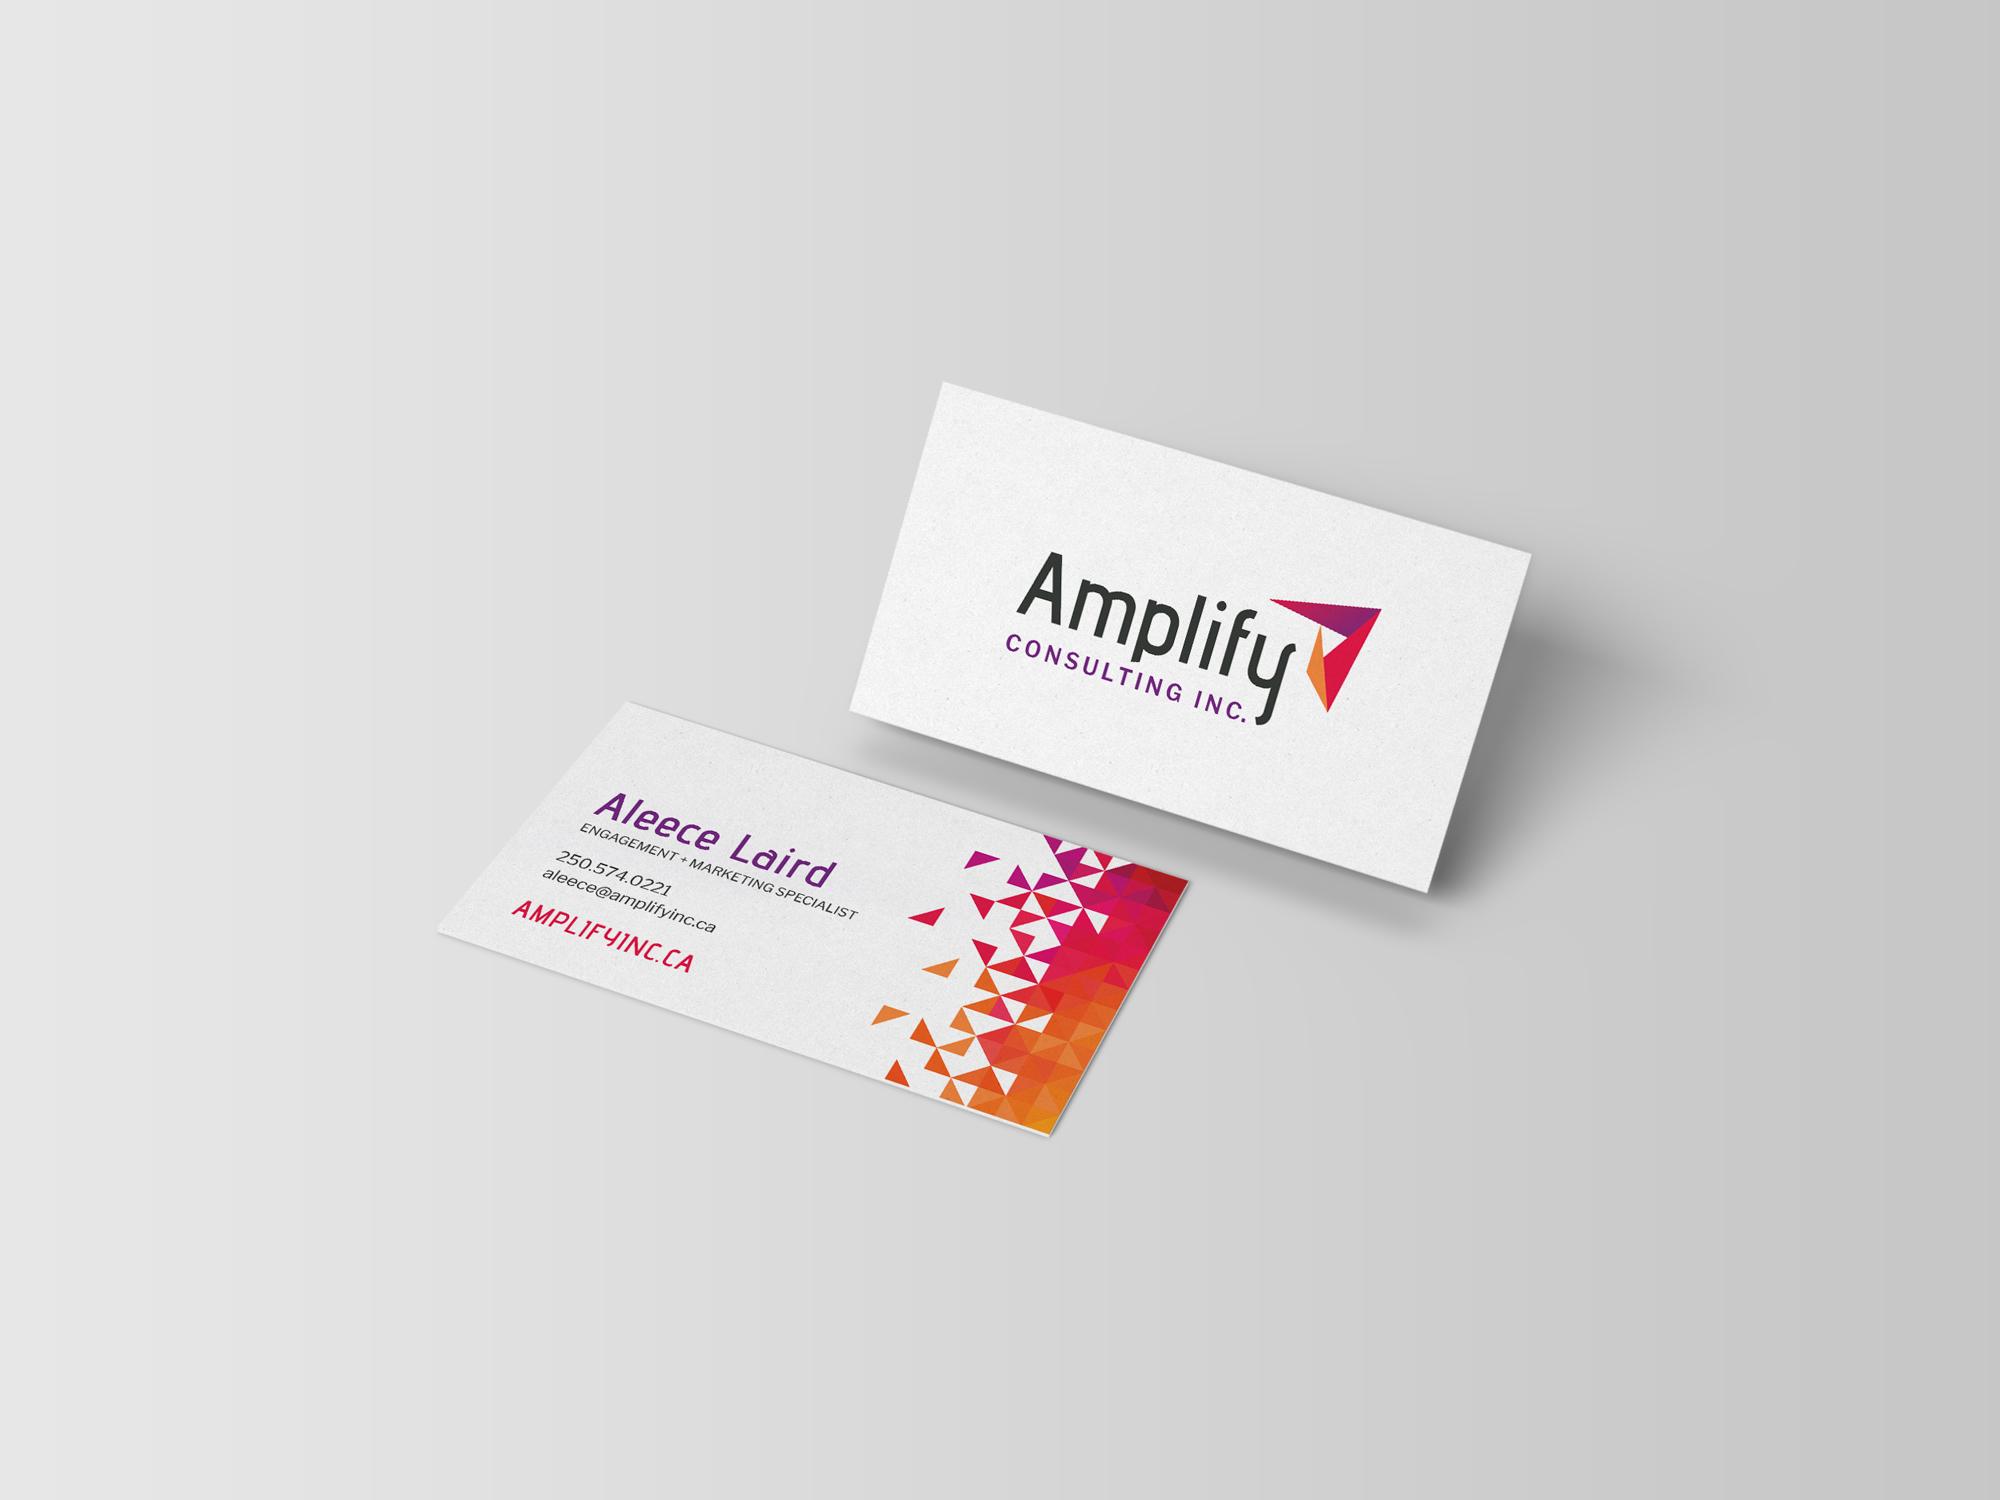 amplify_businesscards_mockup